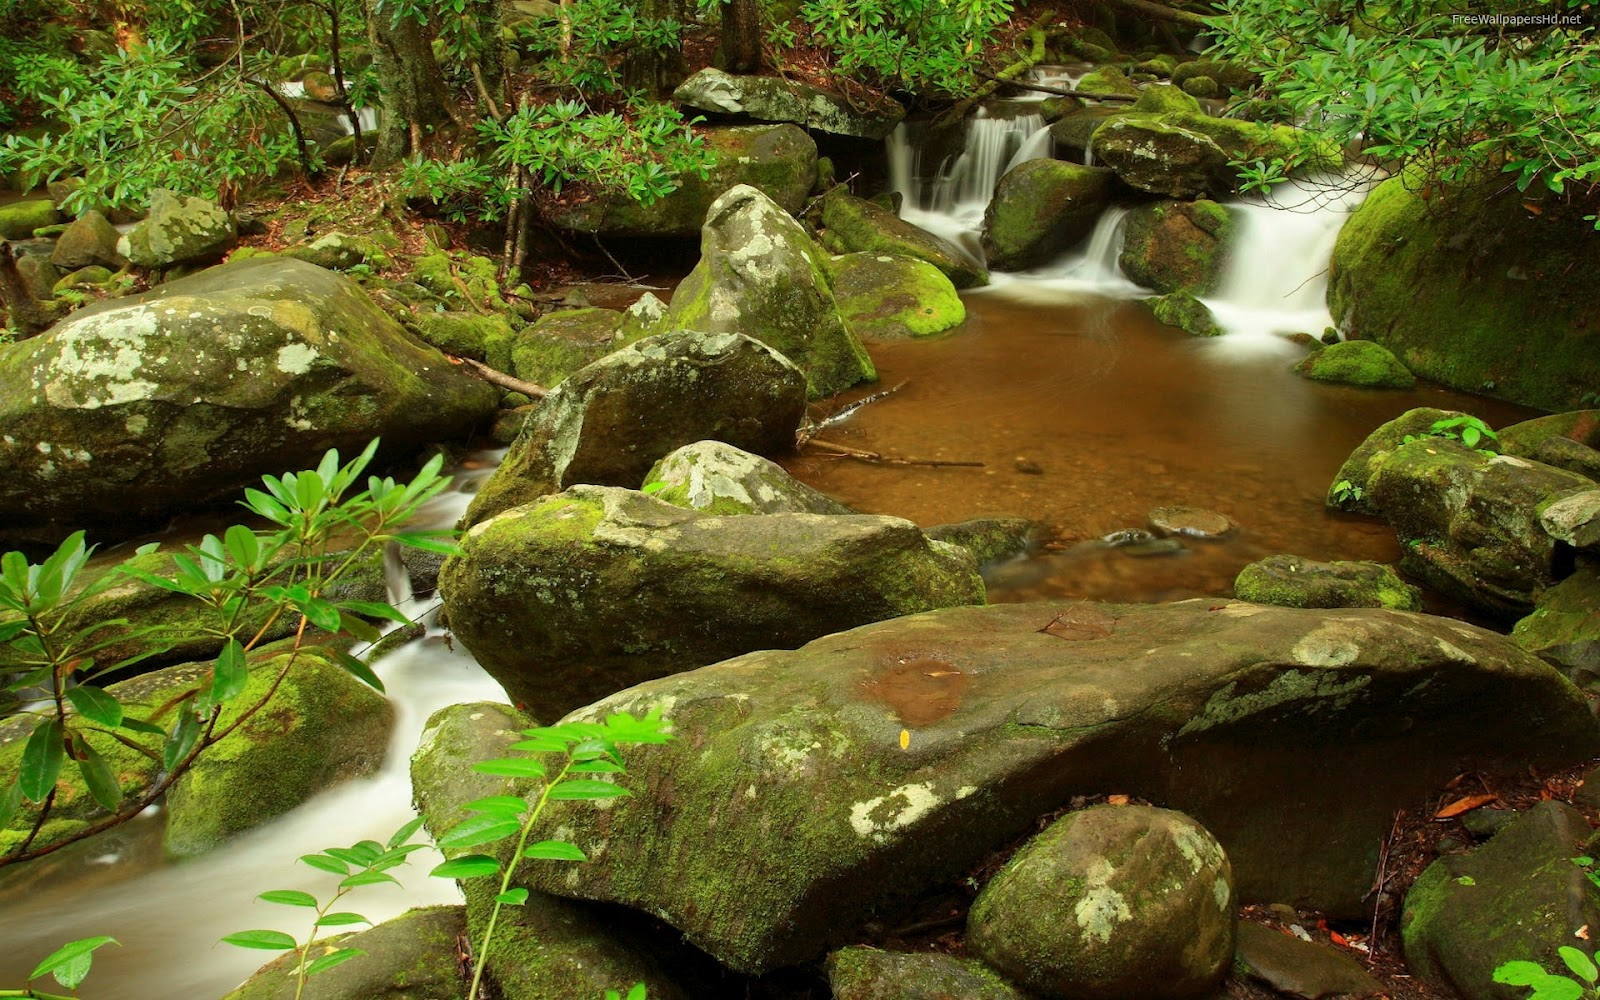 http://2.bp.blogspot.com/-oxphMtvc3lE/UB40k73ESQI/AAAAAAAAACI/u5FYhmYpd50/s1600/jungle-waterfalls-stone-wallpaper.jpg